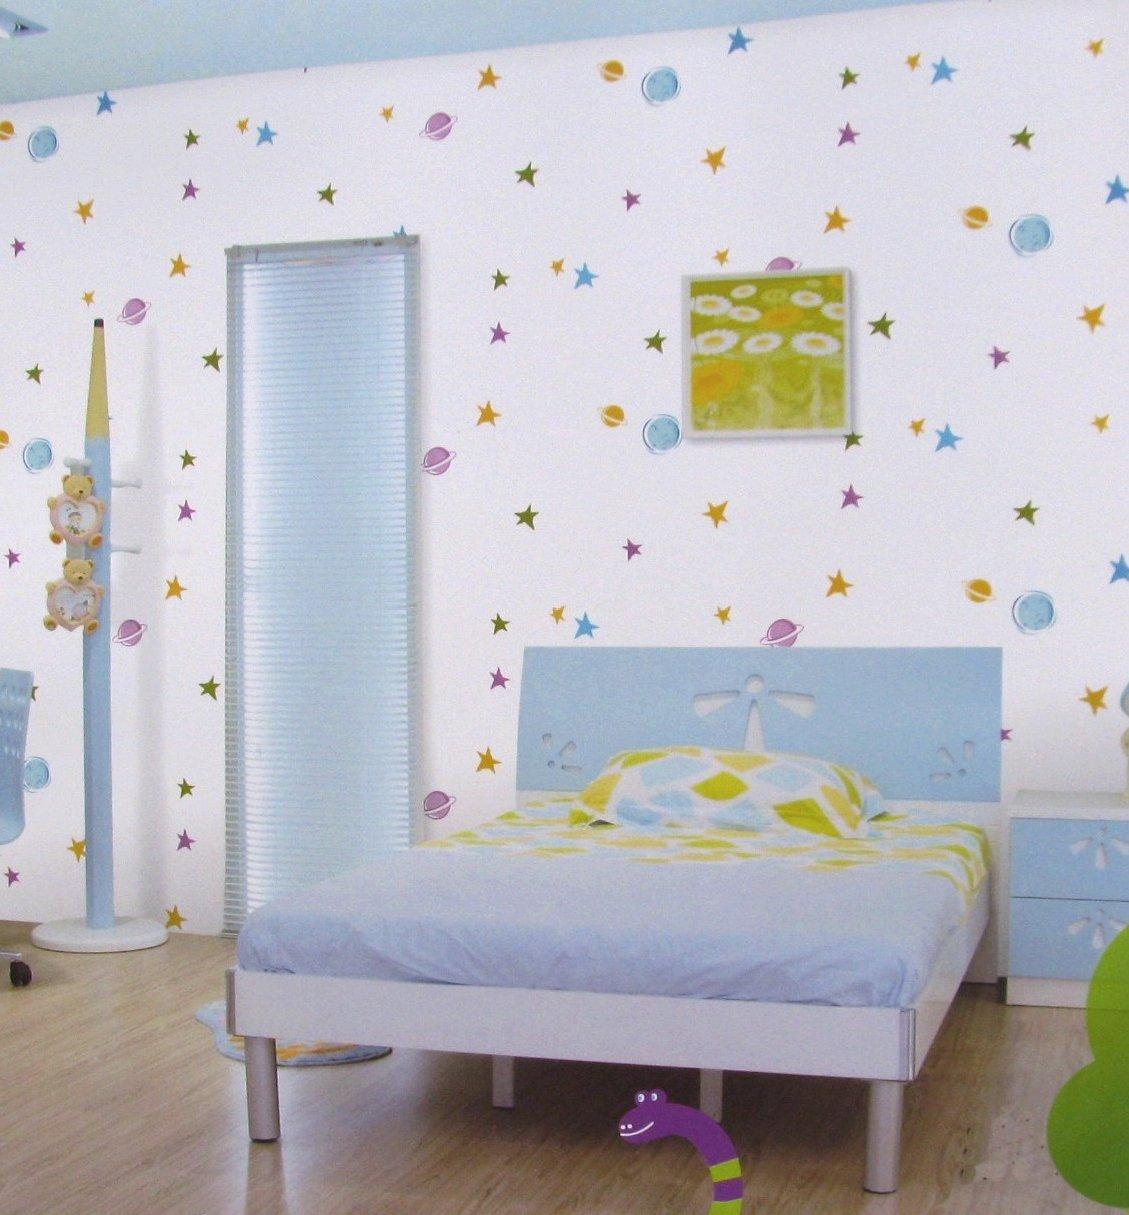 صورة ورق جدران غرف نوم , اجمل ورق حائط فى غرف النوم 1948 7